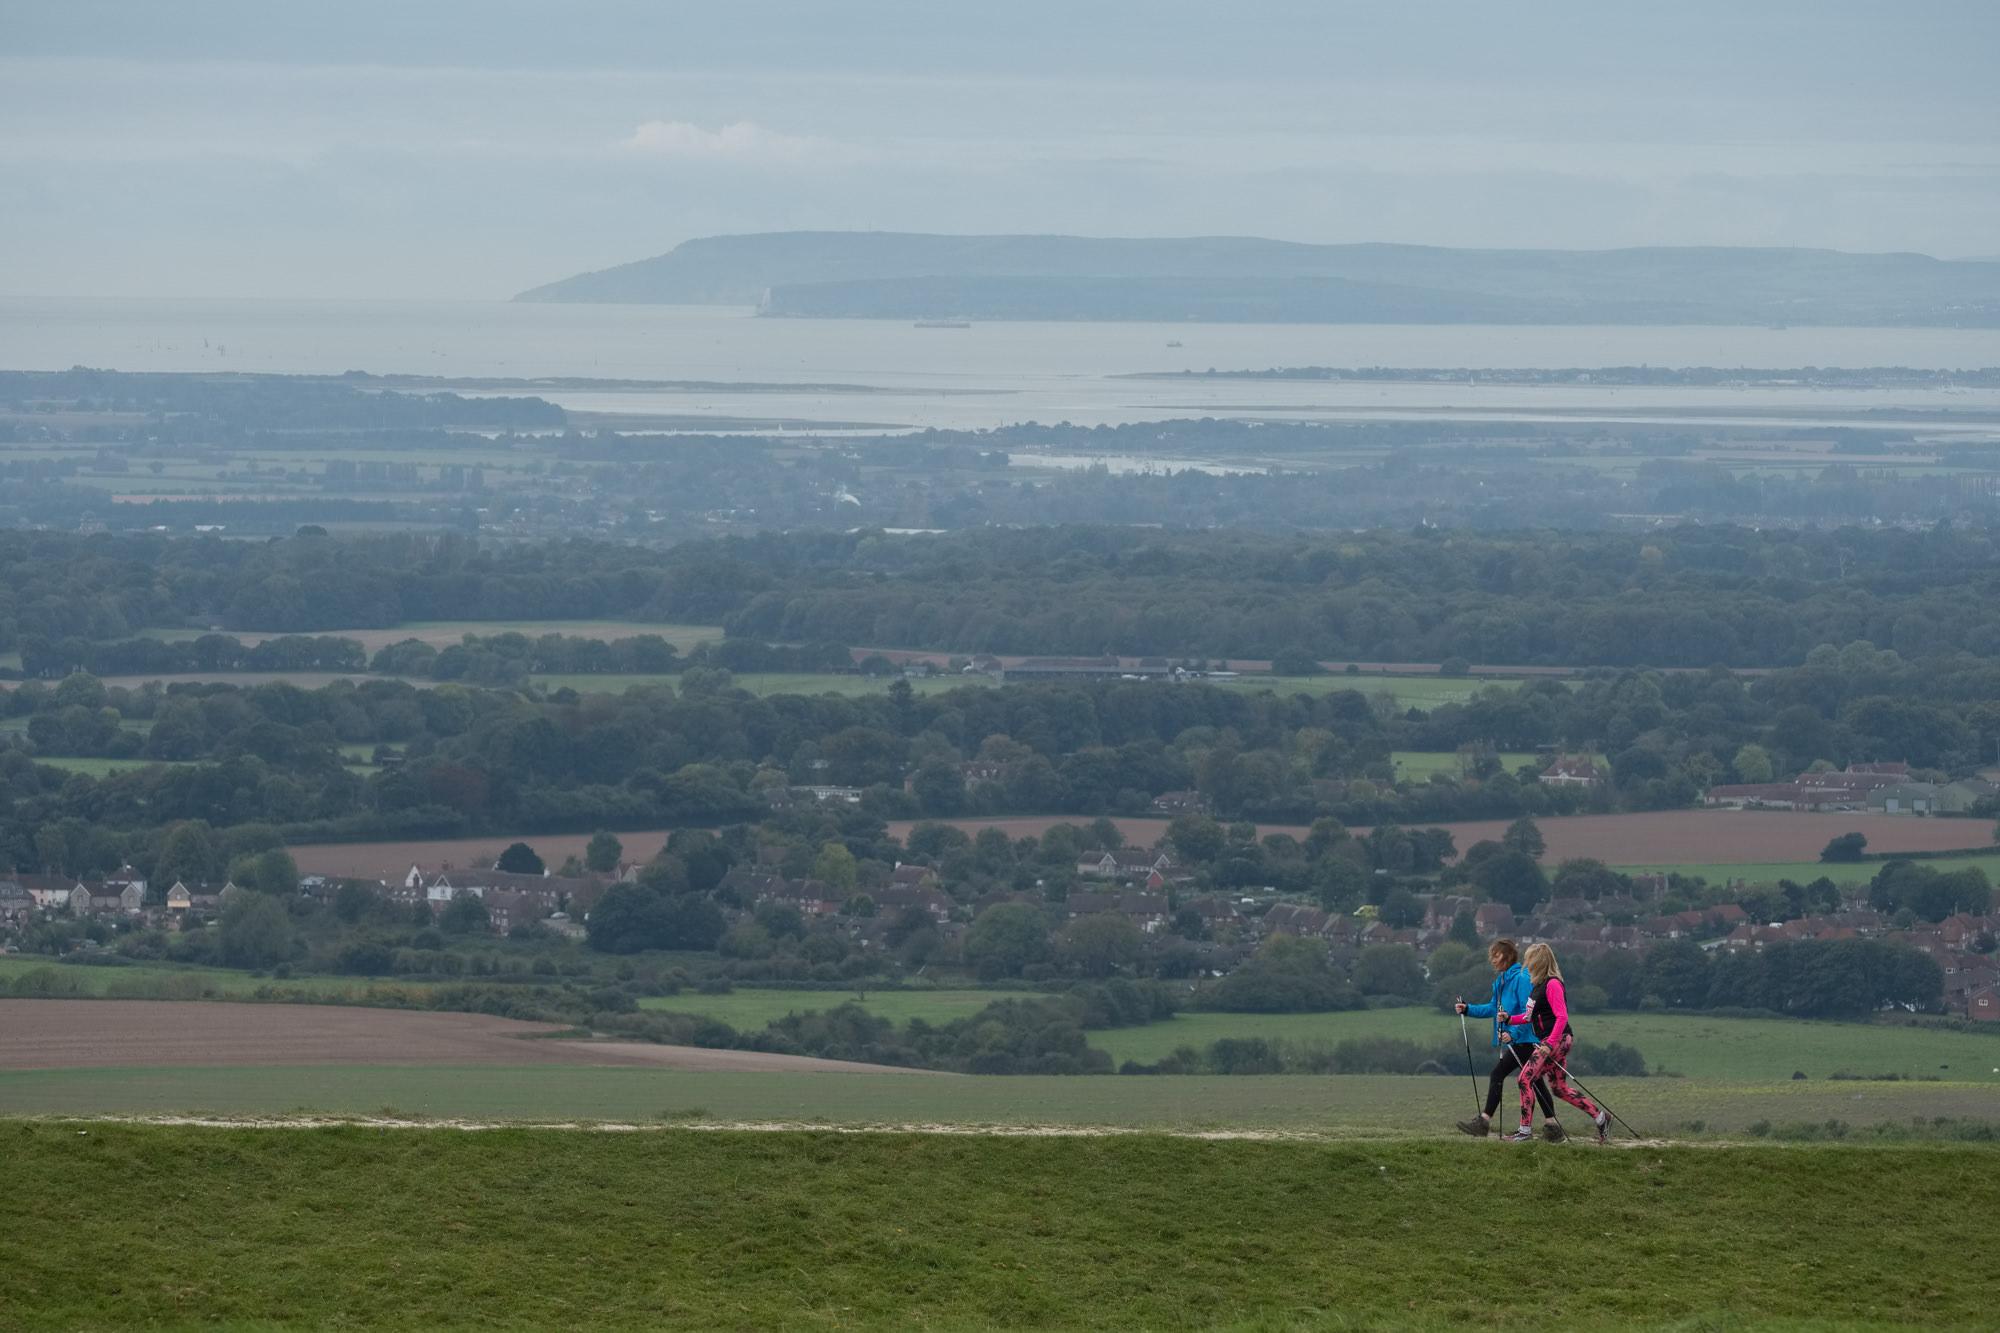 Nordic walking ½ marathon. The Trundle, Chichester